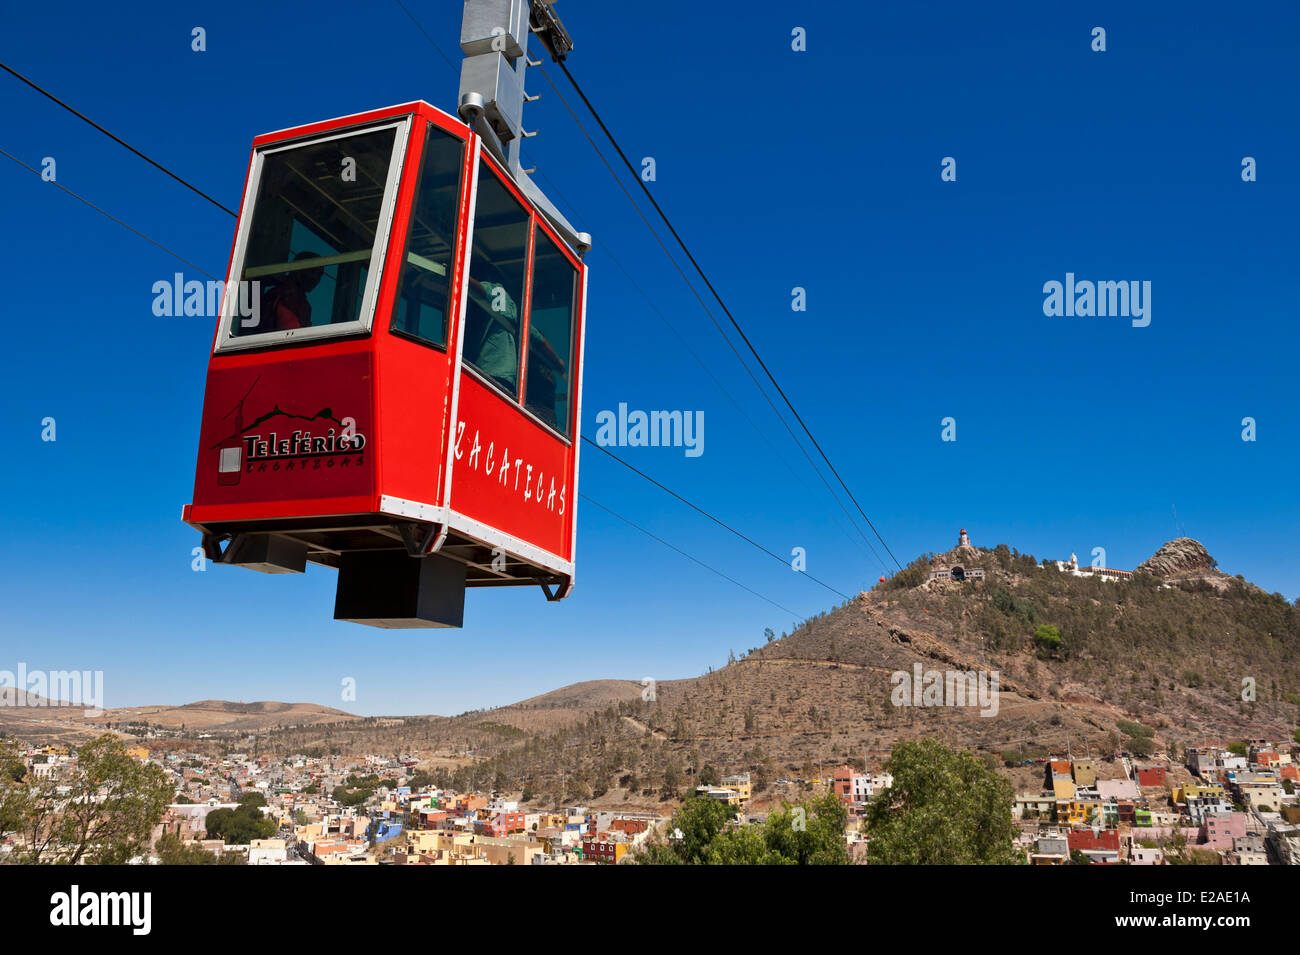 Zacatecas Cable Car Stock Photos Zacatecas Cable Car Stock Images